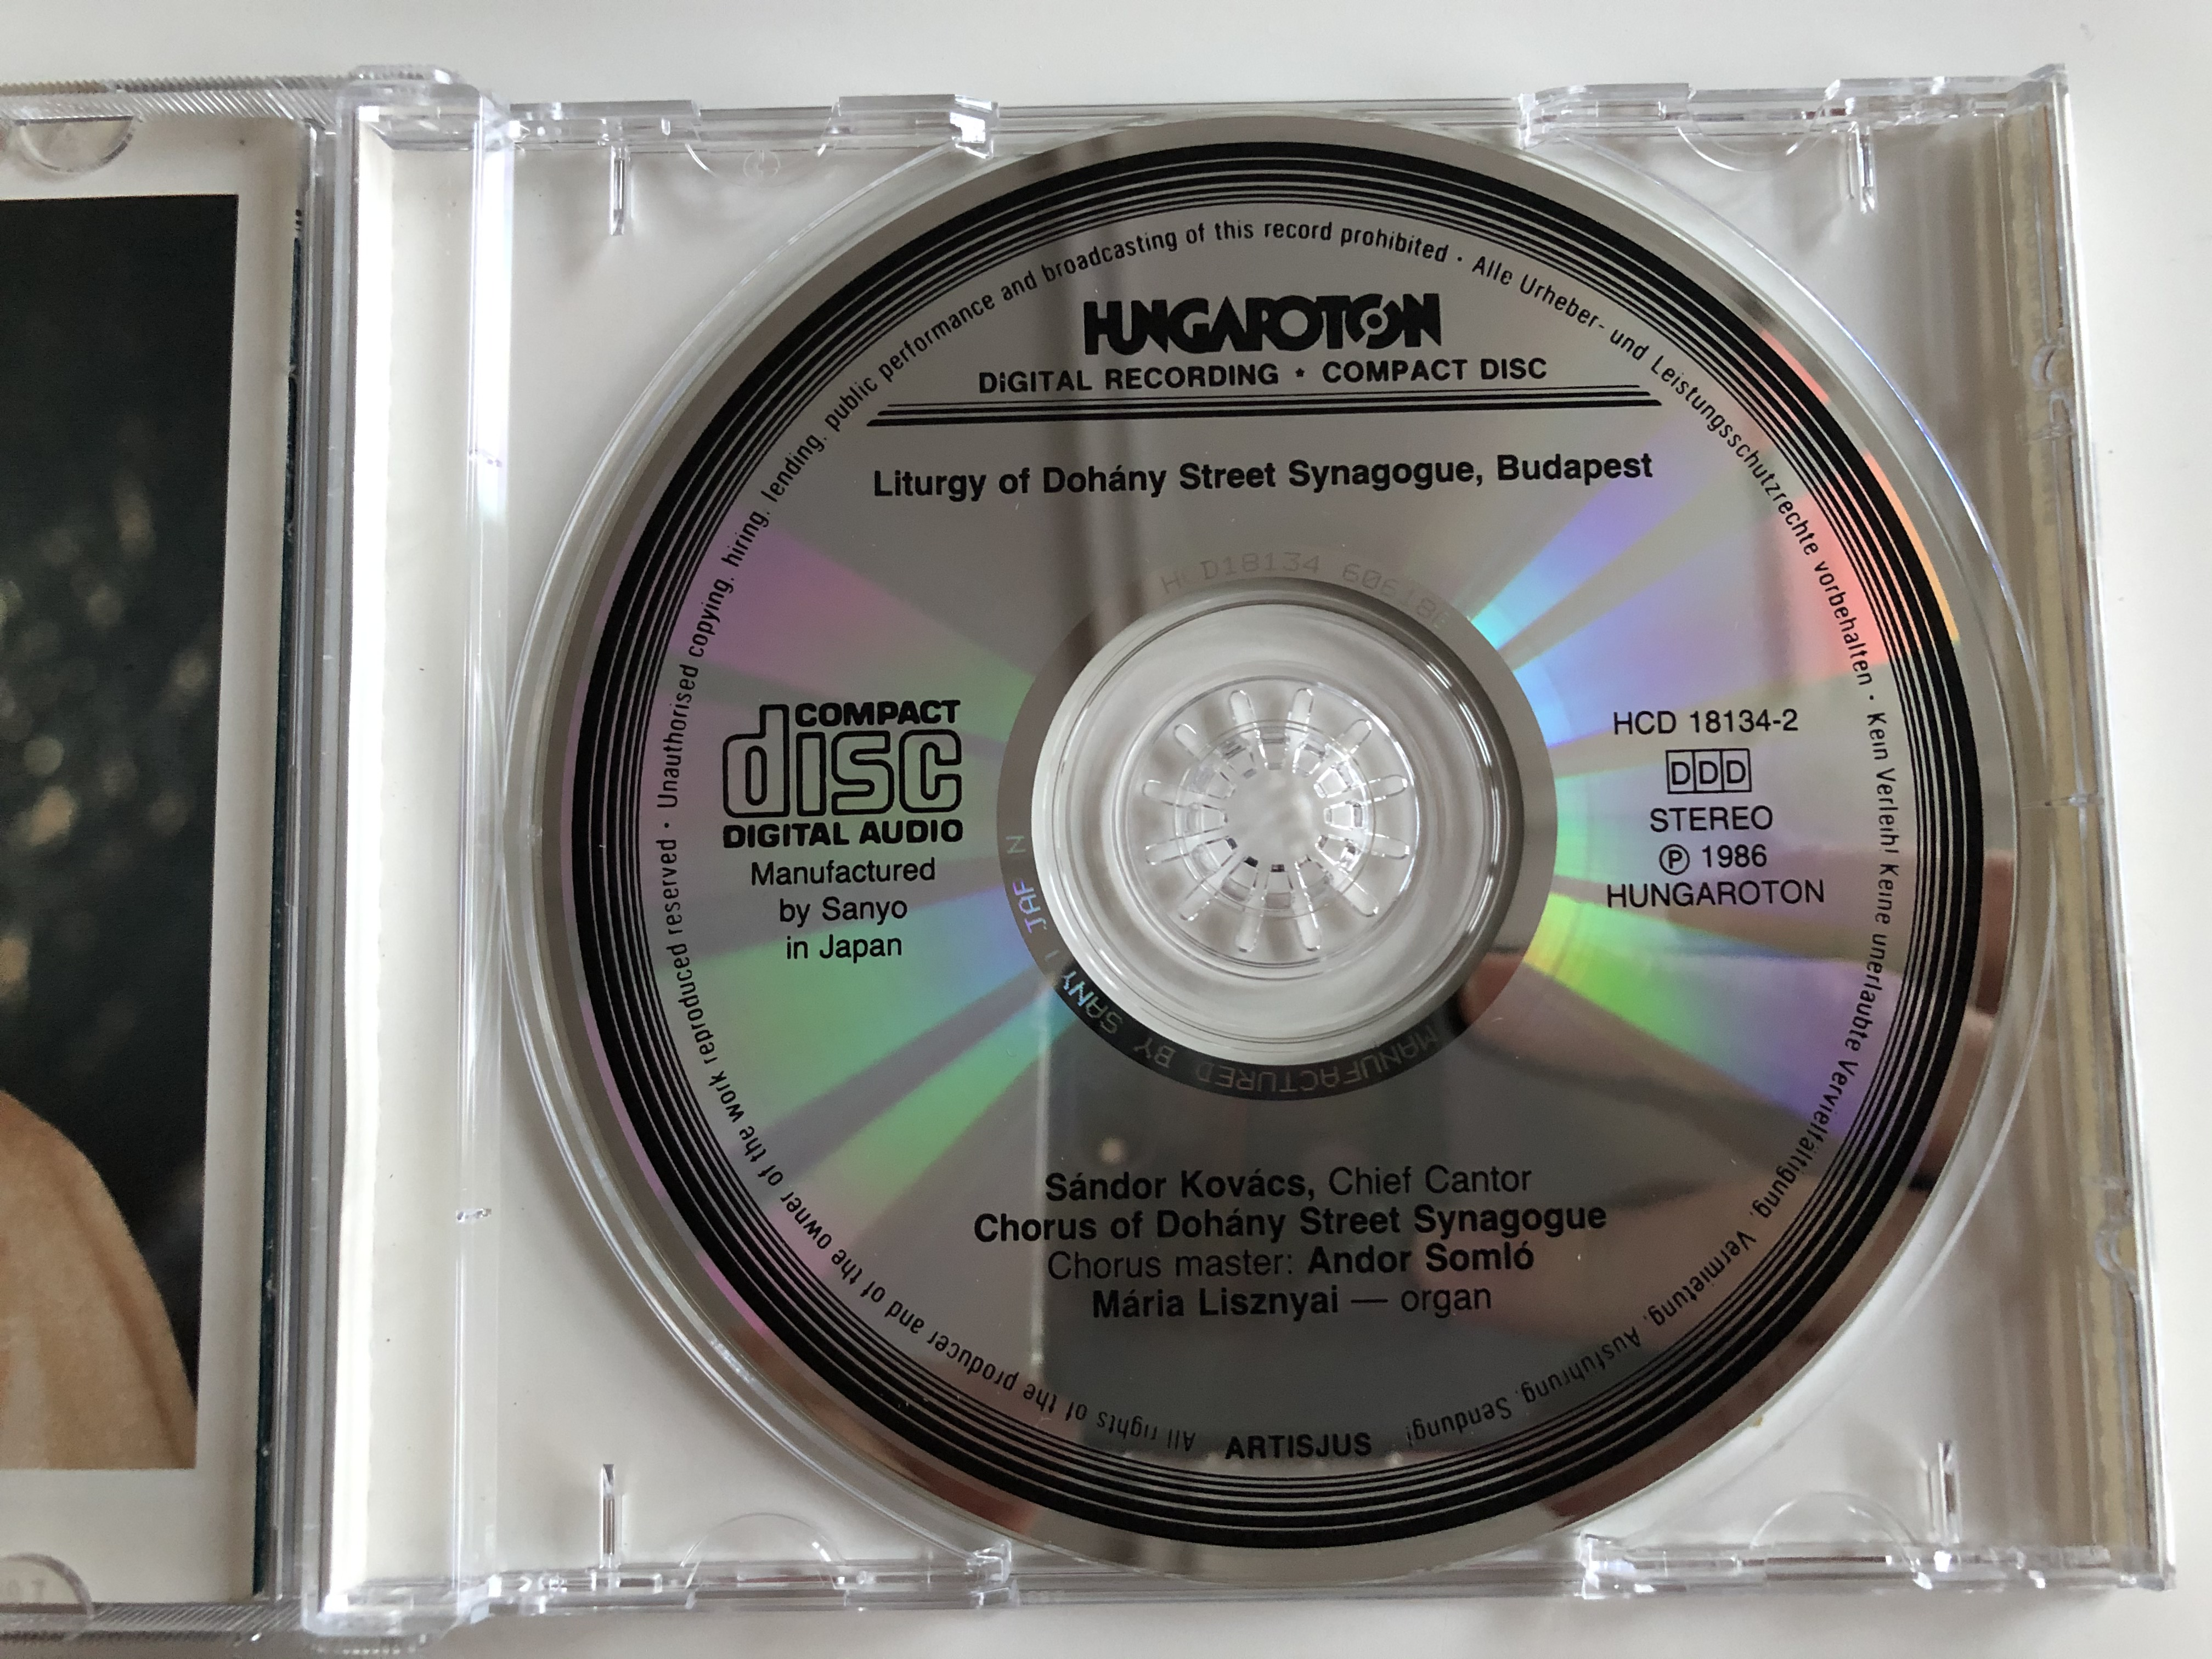 liturgy-of-doh-ny-street-synagogue-s-ndor-kov-cs-chief-cantor-hungaroton-audio-cd-1986-stereo-hcd-18134-2-6-.jpg